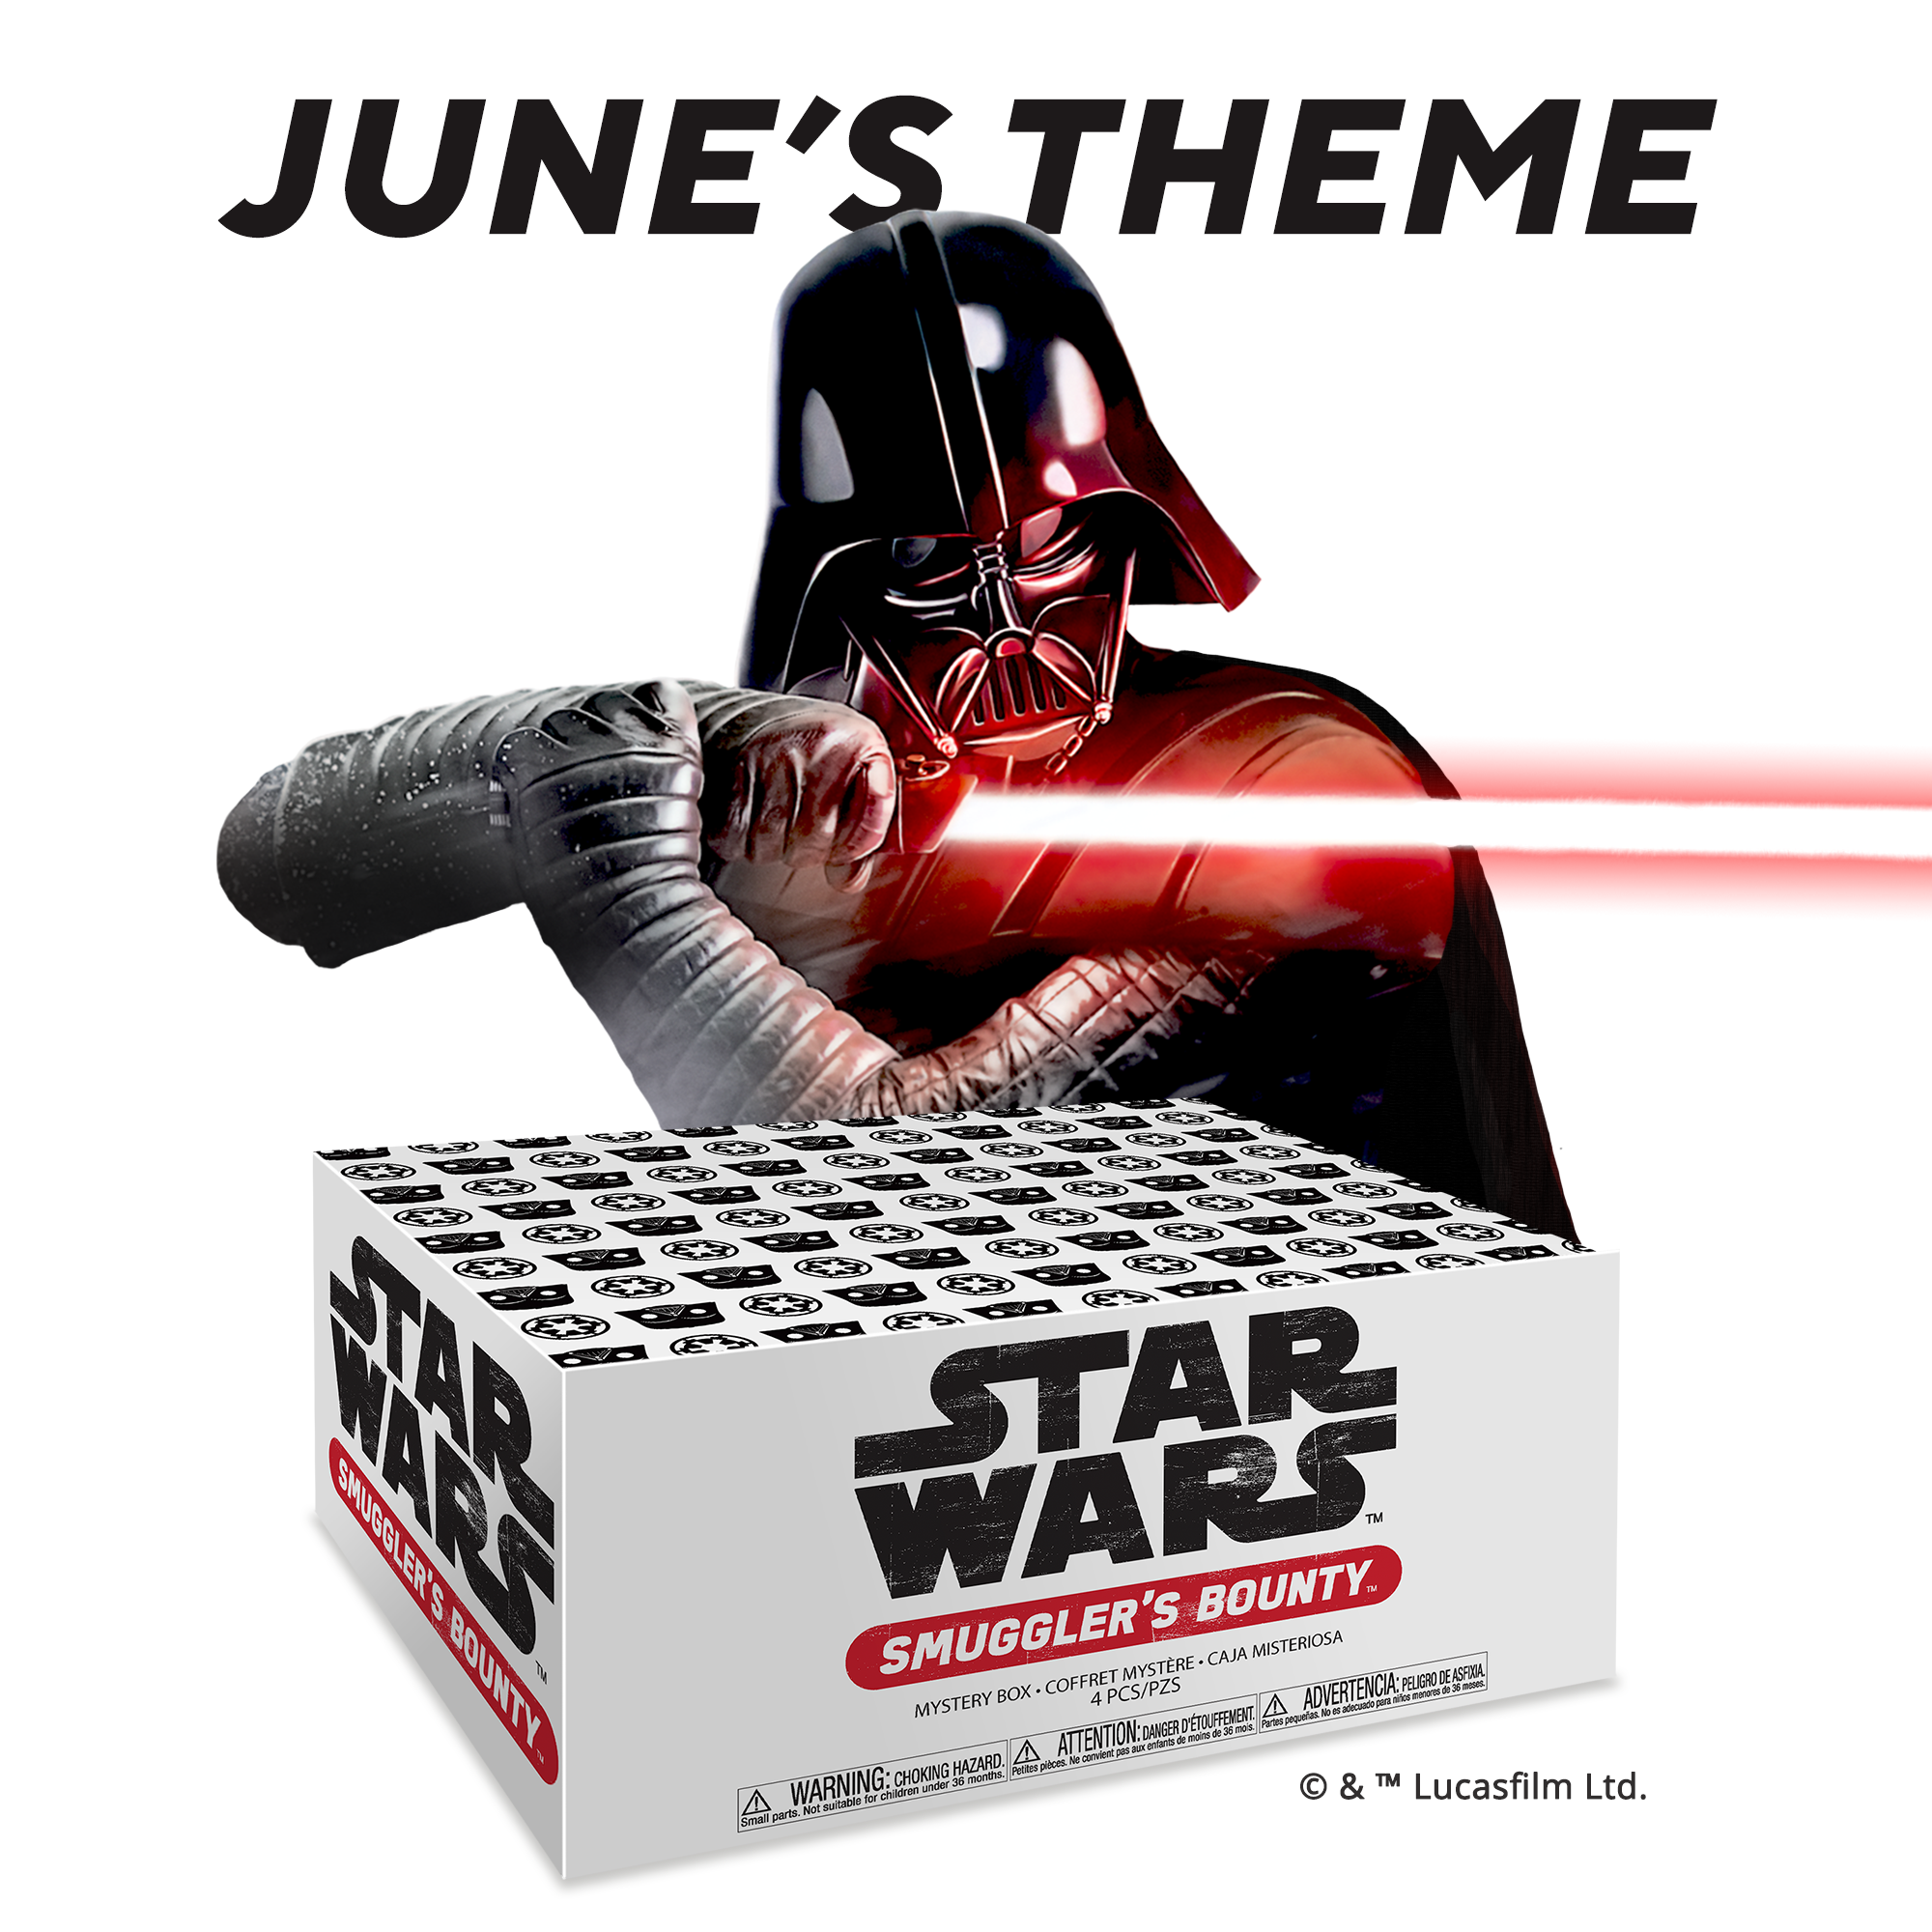 Funko Star Wars Smuggler's Bounty Box from Funko